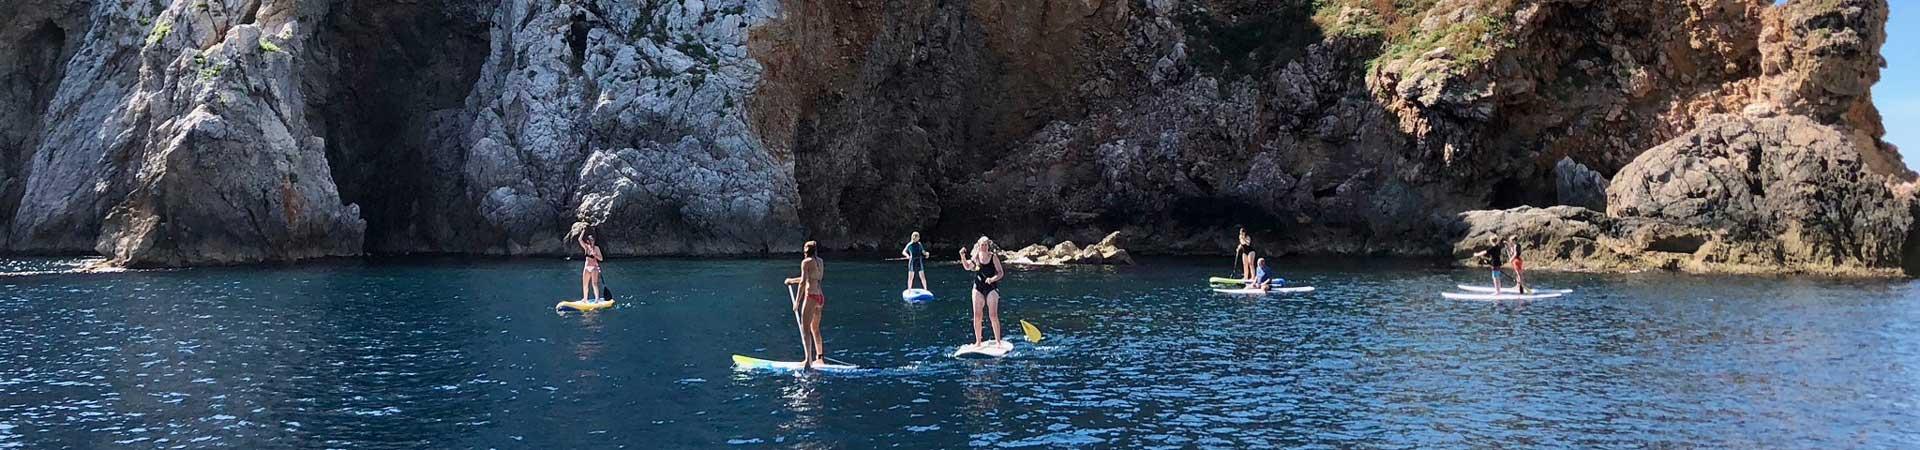 excursio paddles surf a islas medas